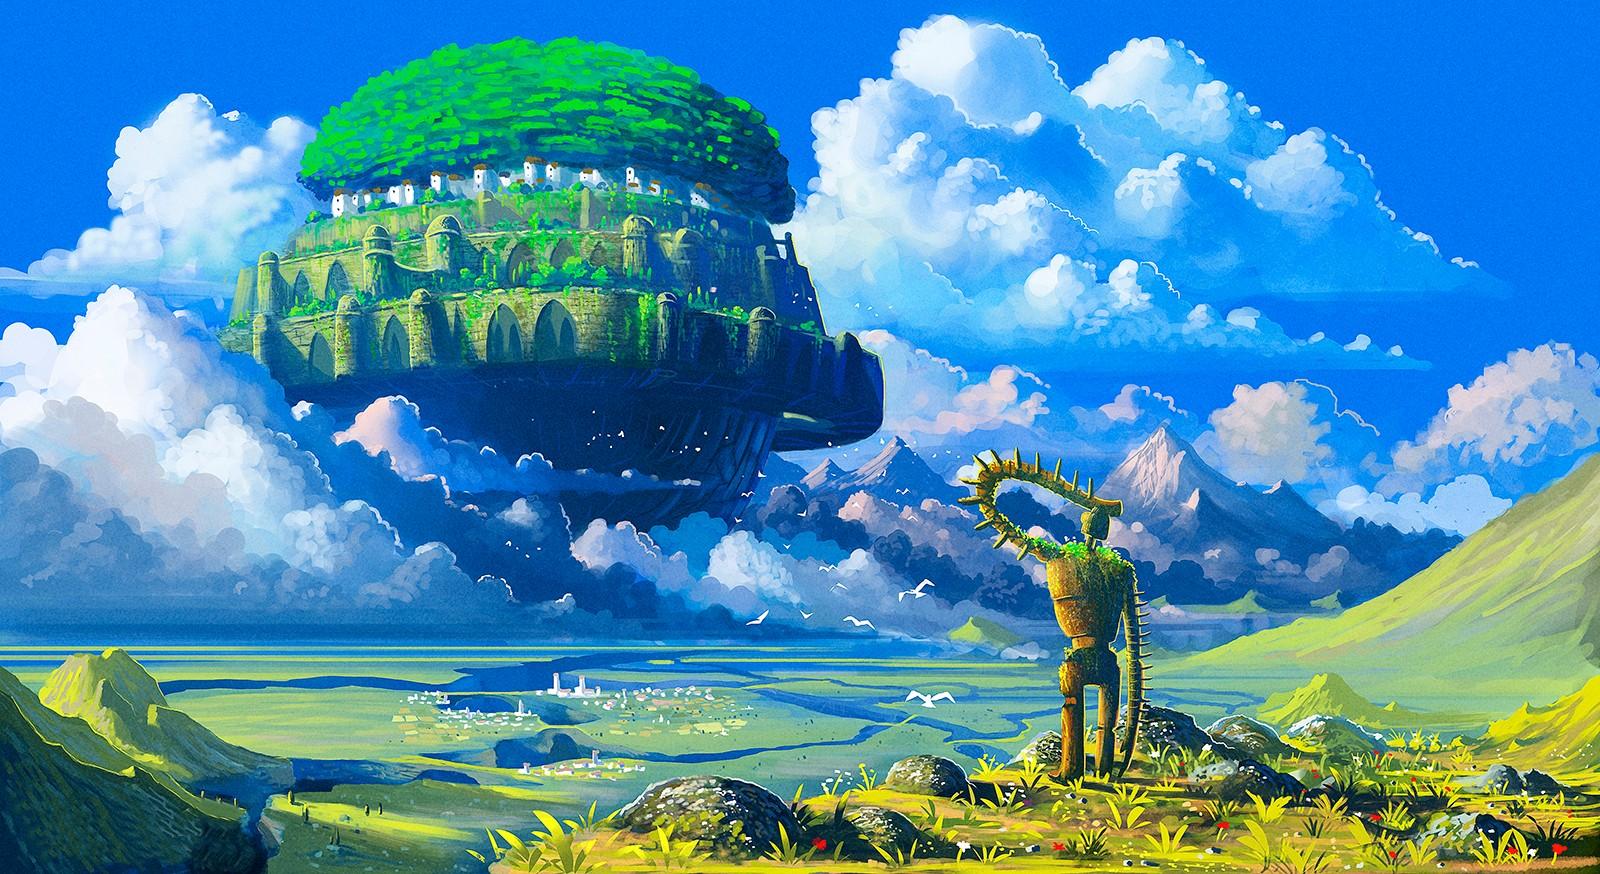 Wallpaper Illustration Anime Robot Sky Earth Floating Island